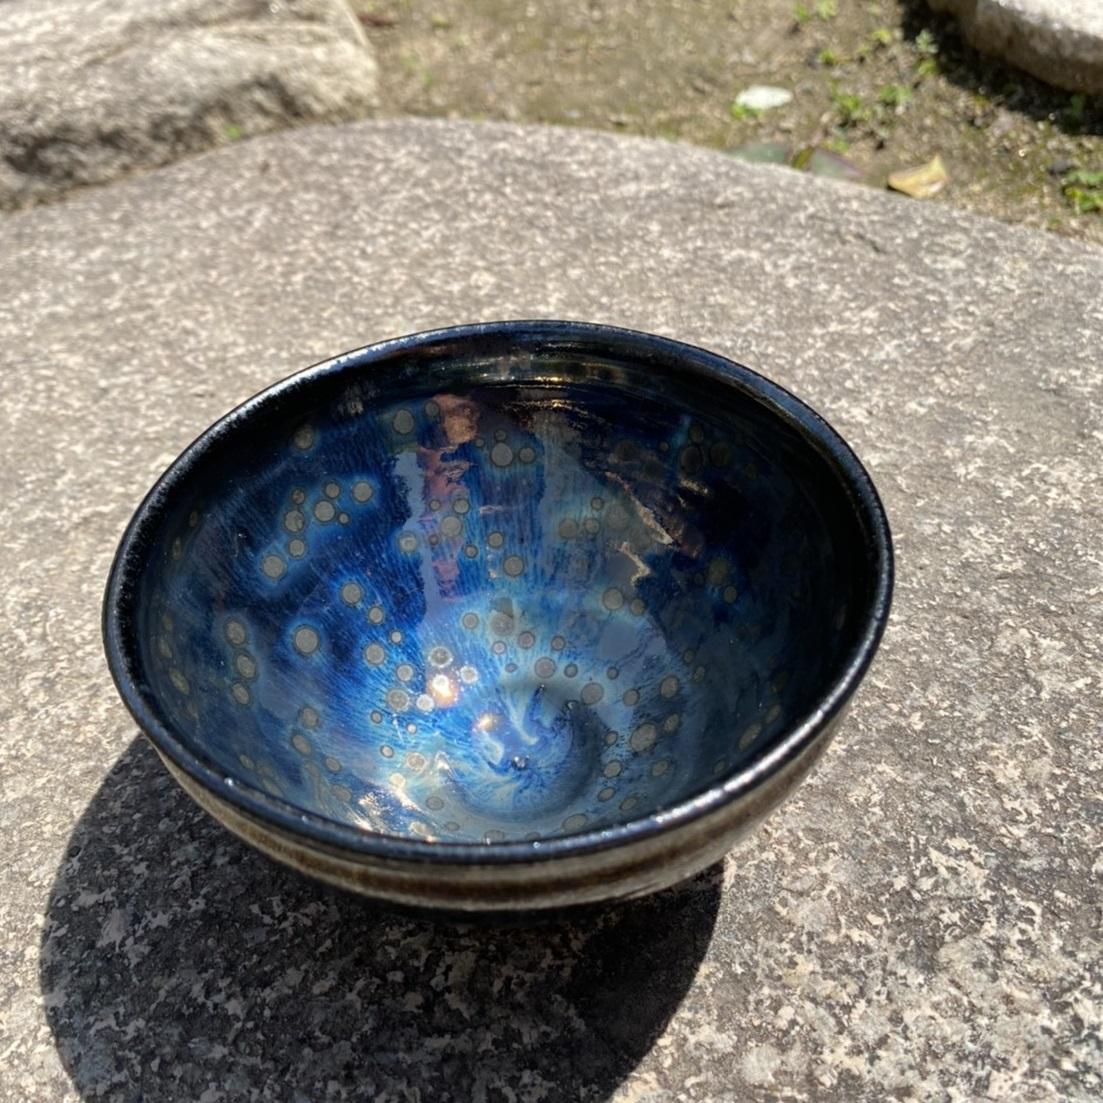 099H263 「焼き物」曜変天目茶碗